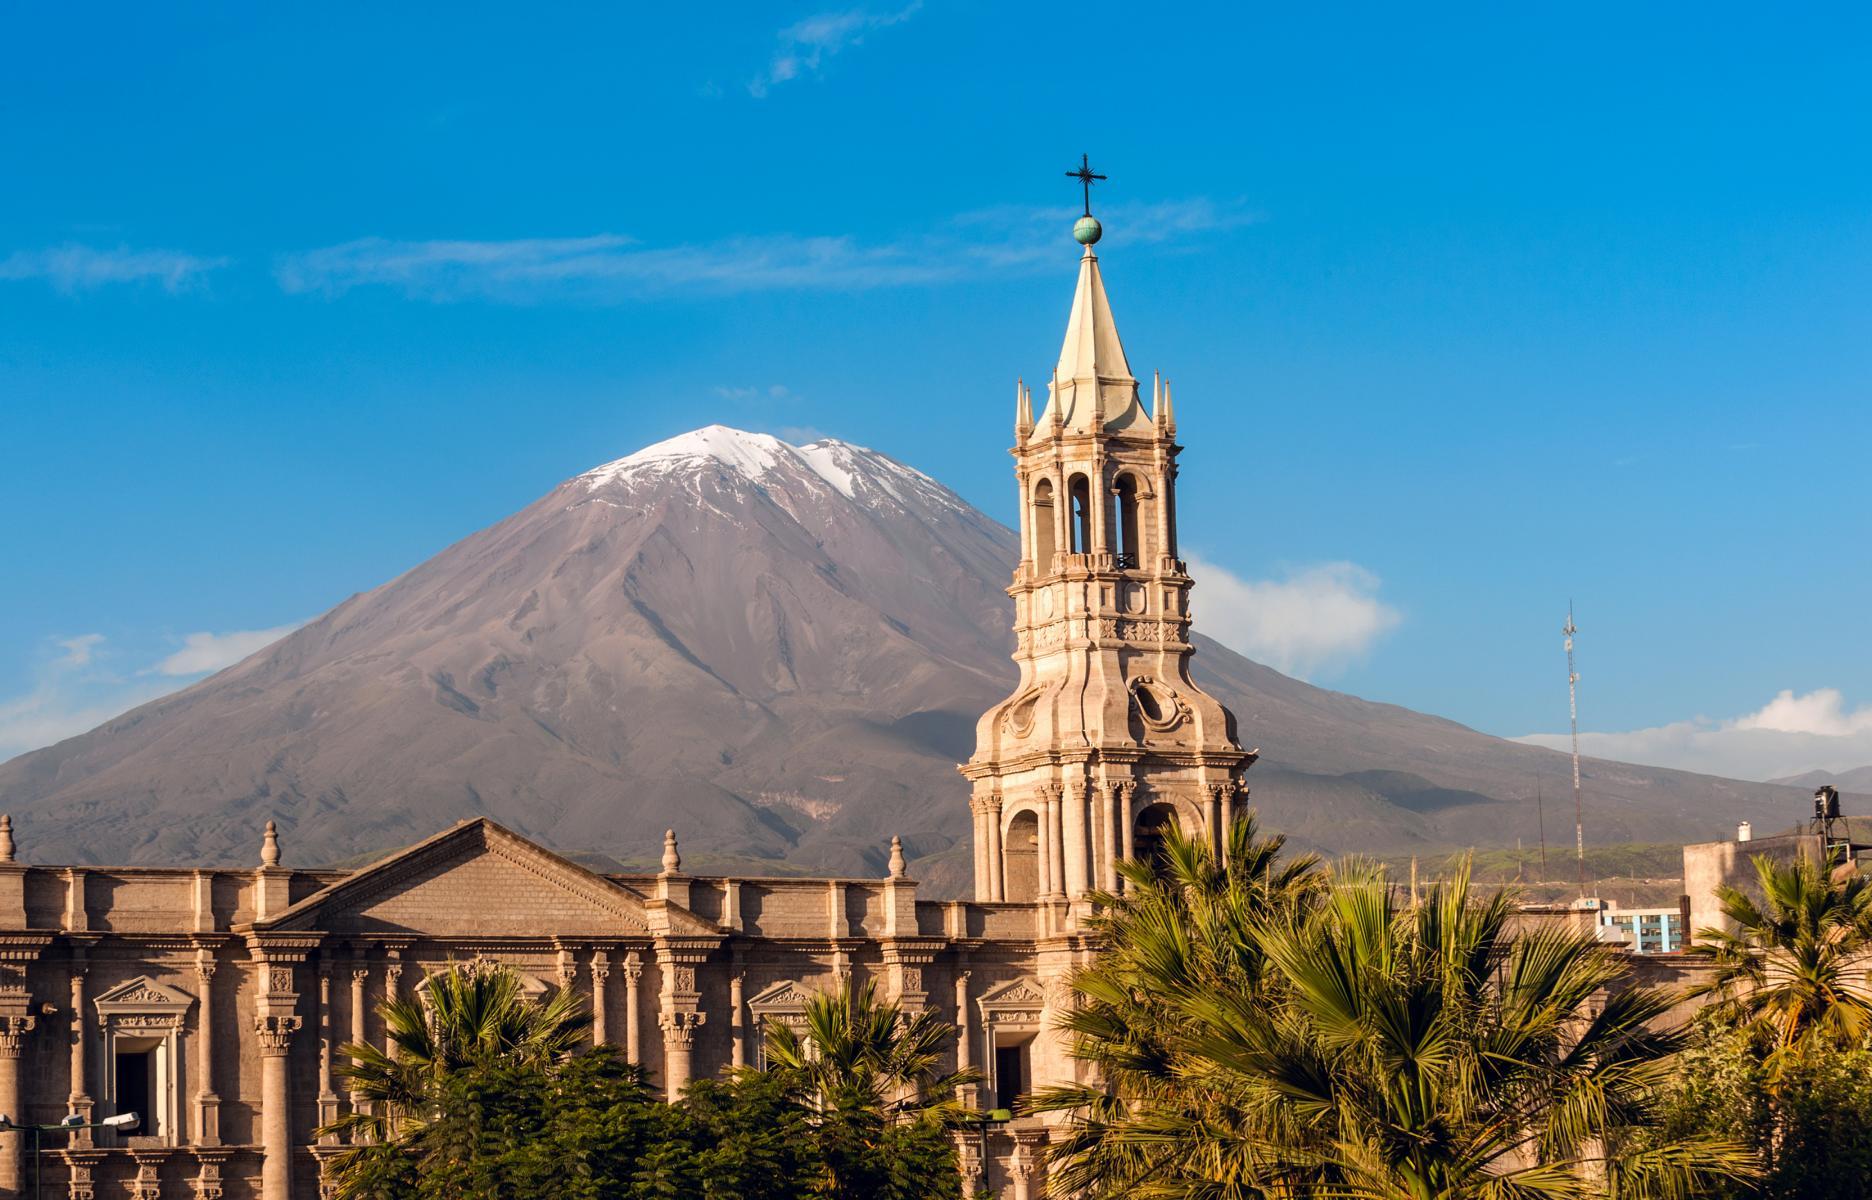 Rundreise - K1600_Arequipa-Peru-Volcano-El-Misti-shutterstock_192977669.jpg